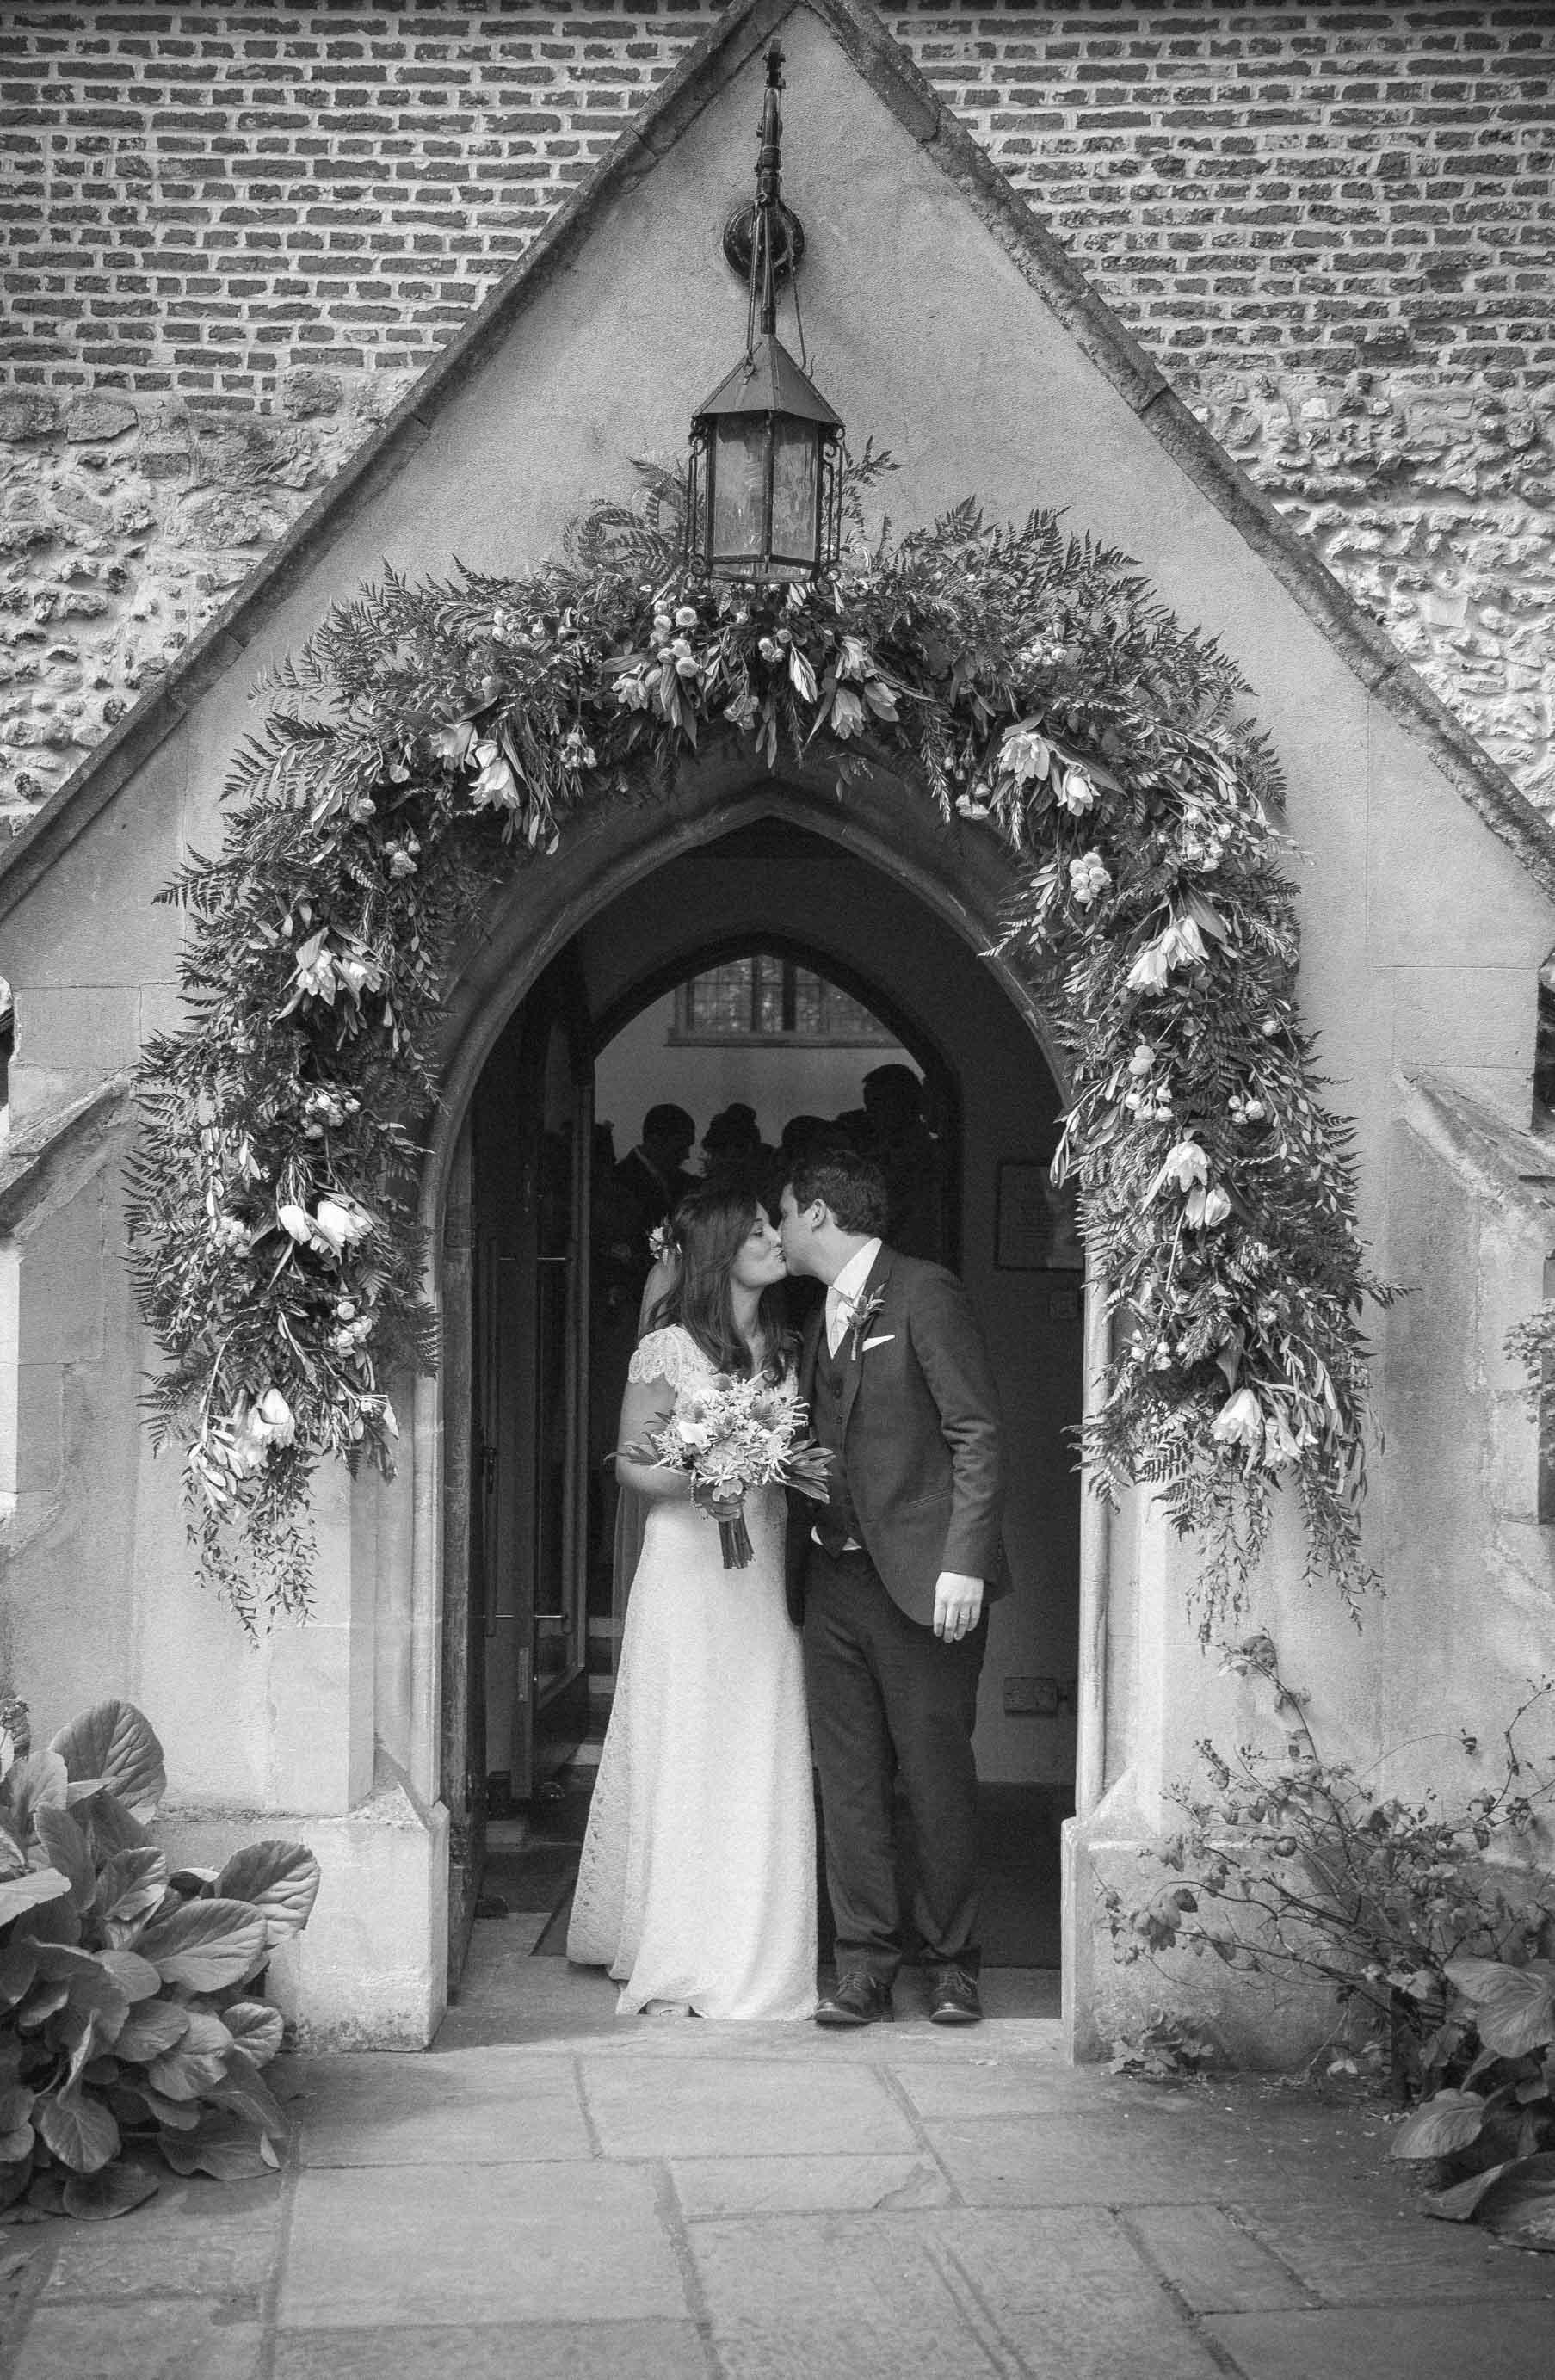 barnes-wedding-adam-rowley-photographer-st-mary's-church-2